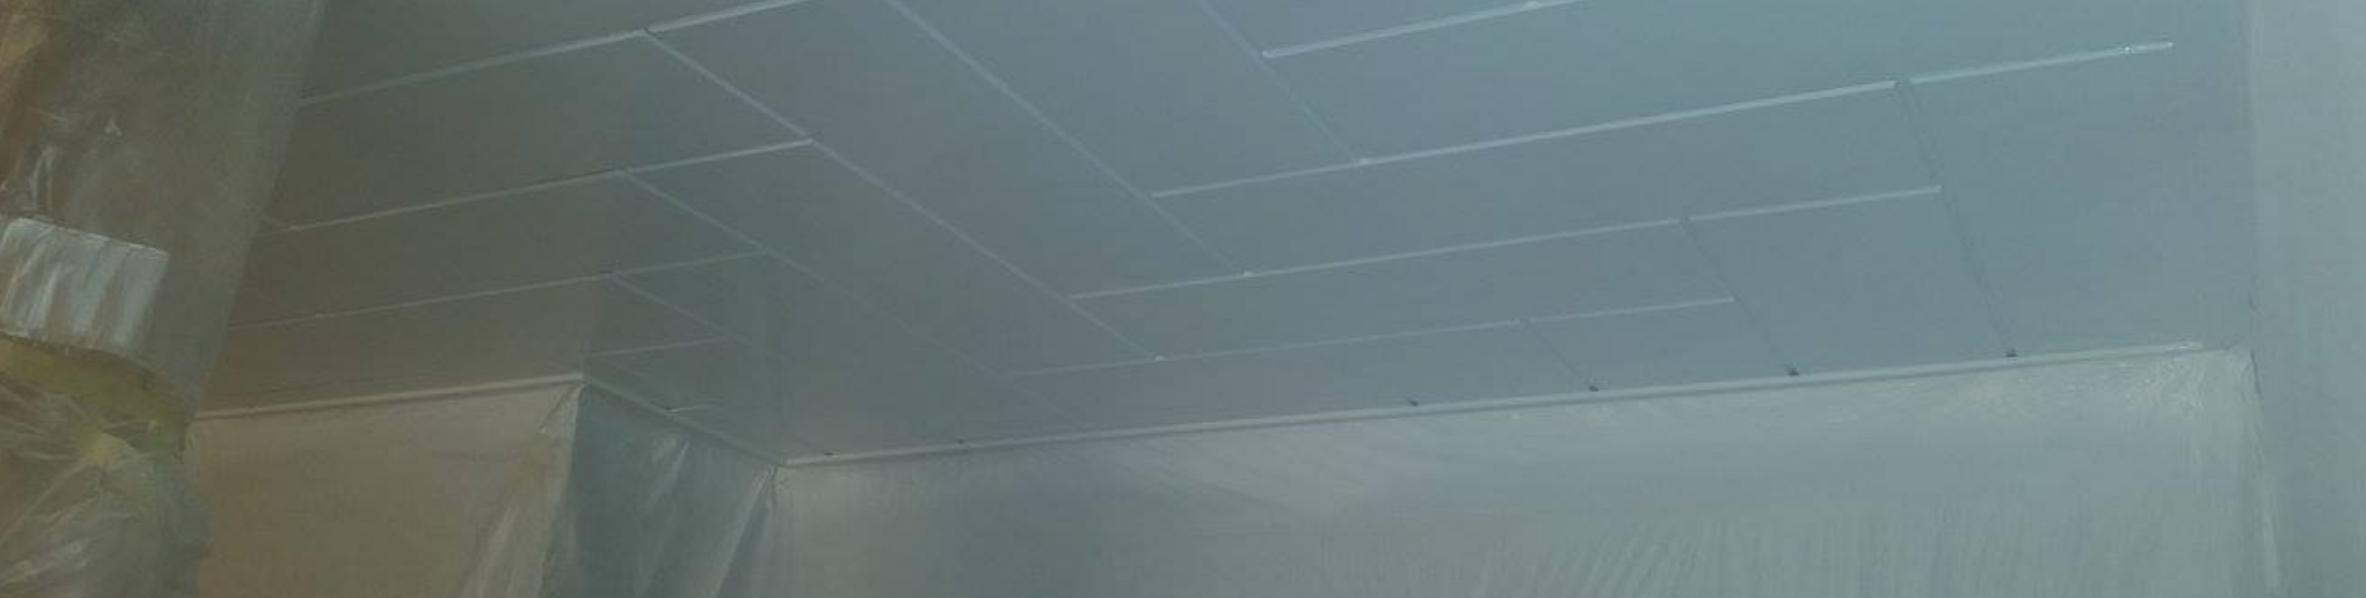 plafond spuiten 1.2